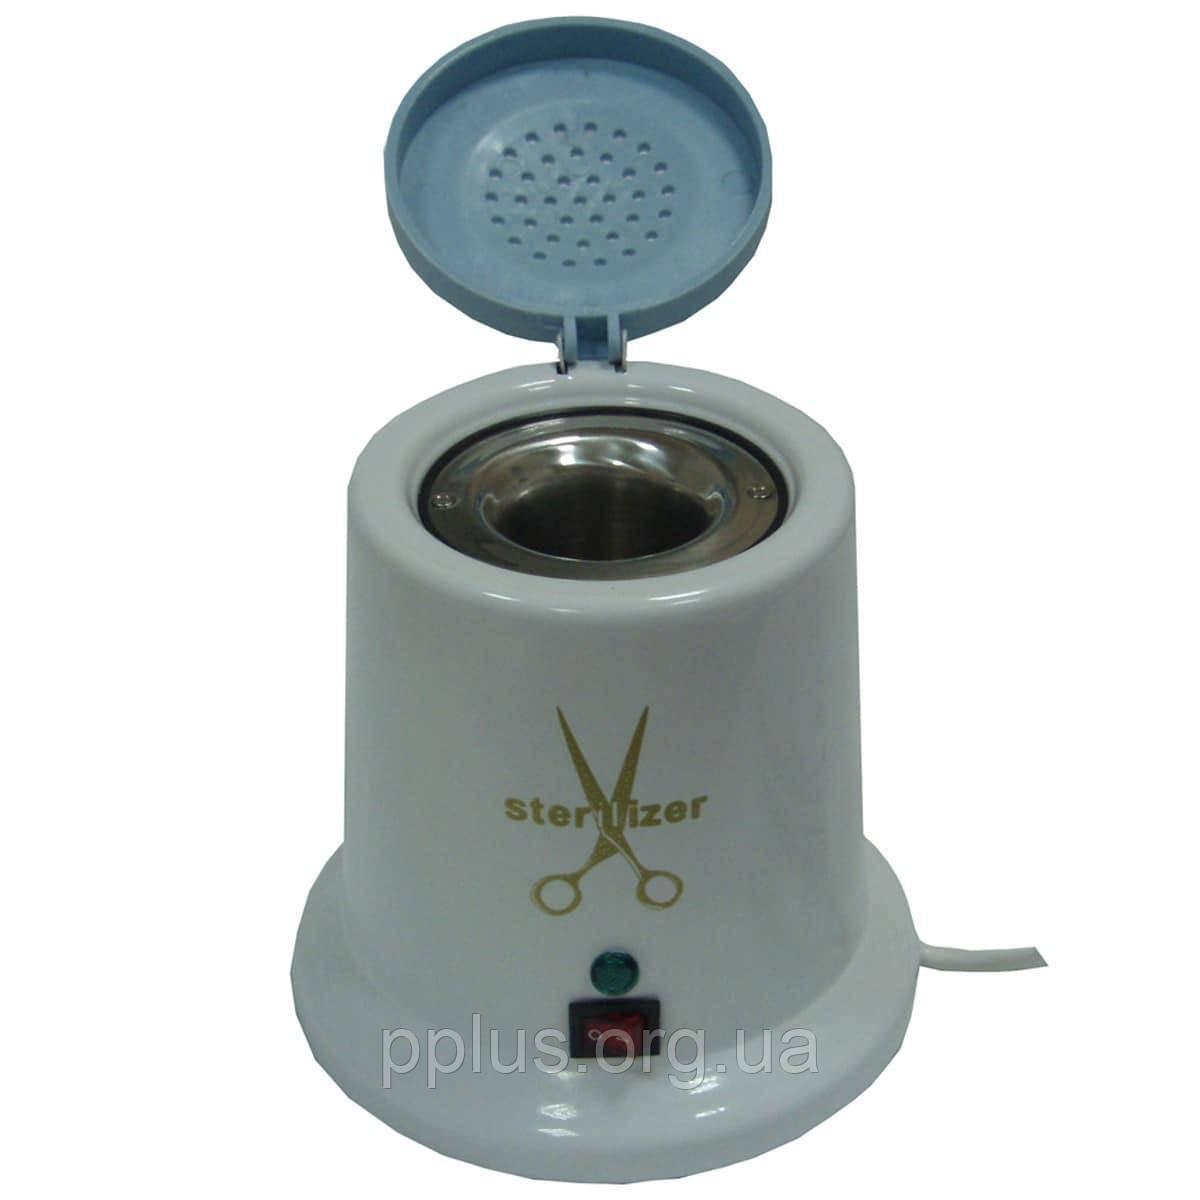 Стерилізатор кварцовий Beauty Tools Sterilizer 100W